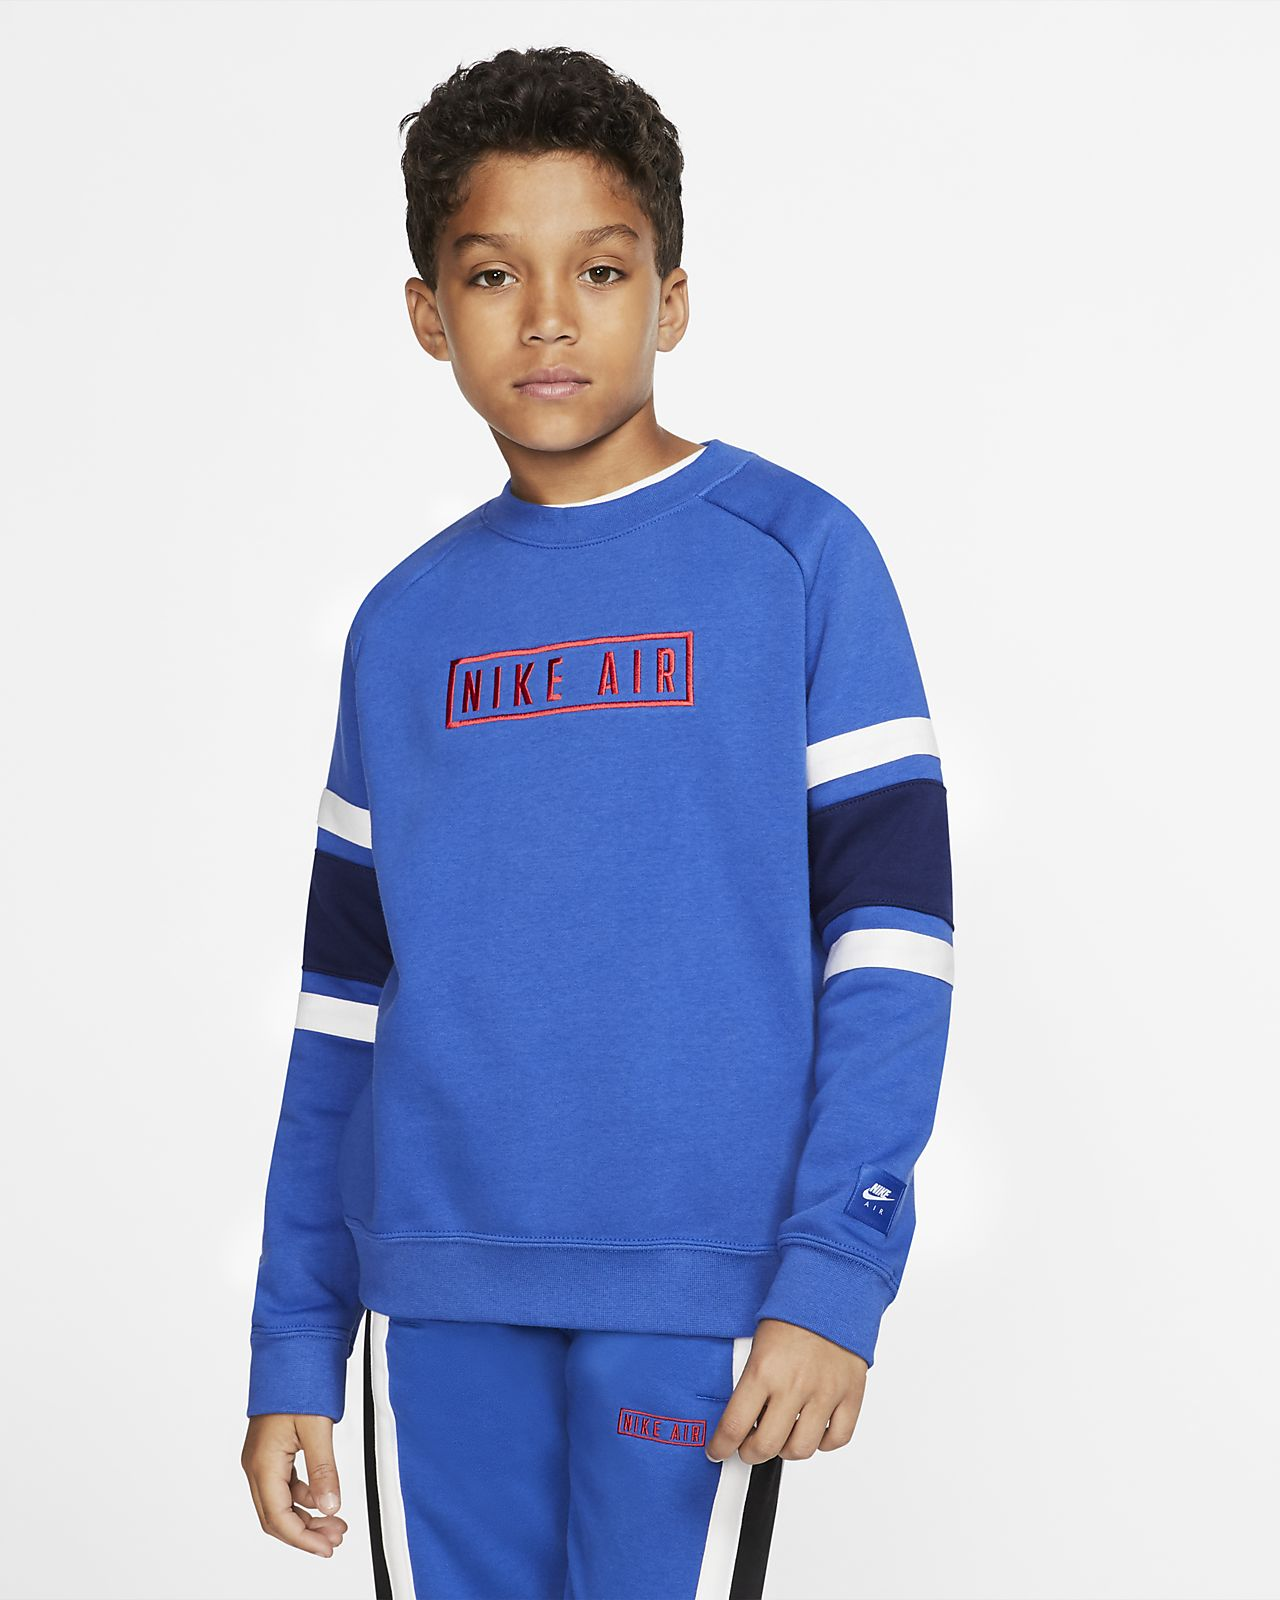 Nike Air Older Kids' (Boys') Crew